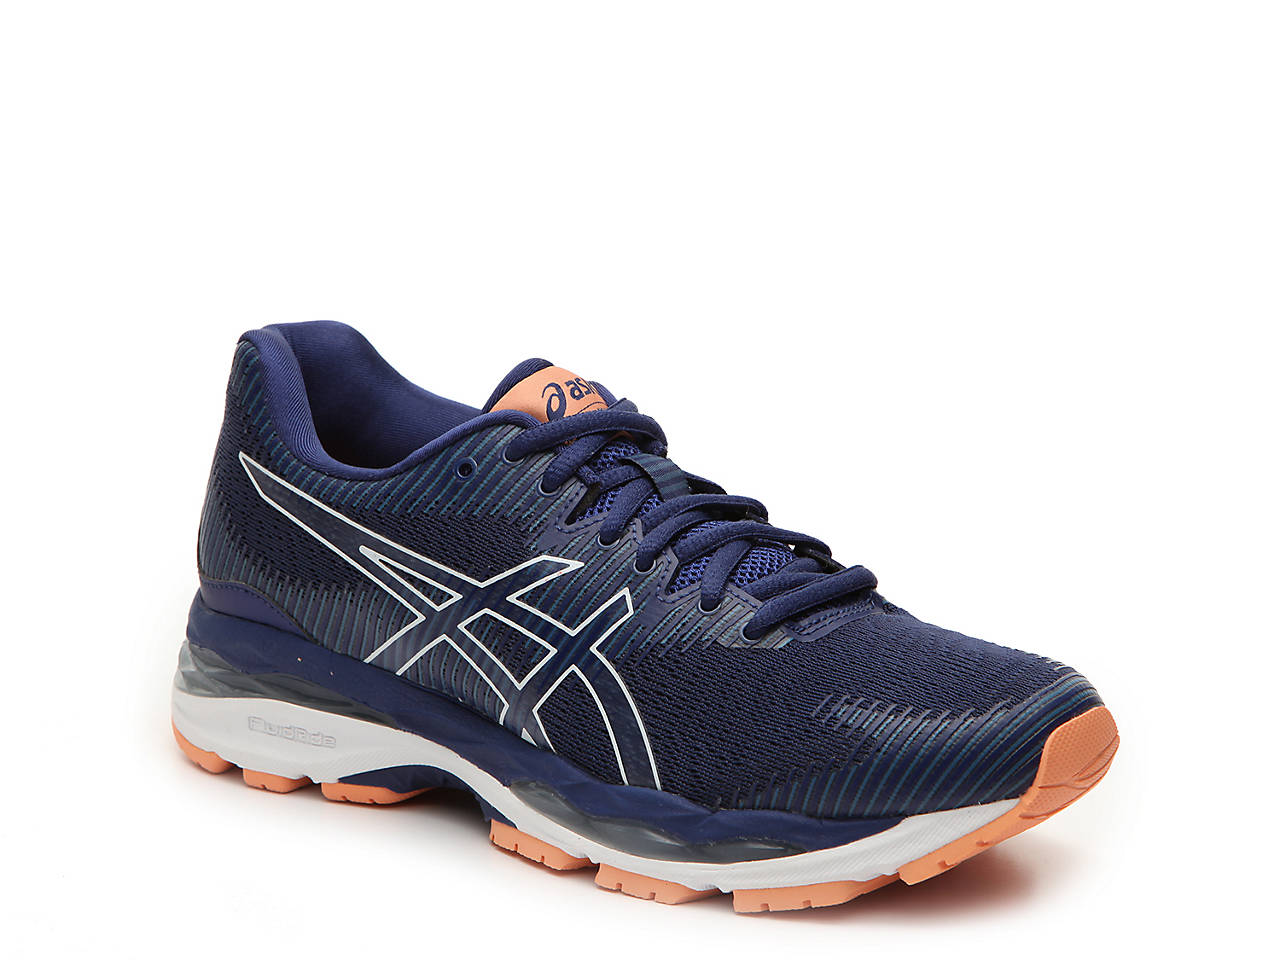 96bd56aecb ASICS GEL-Ziruss Performance Running Shoe - Women s Women s Shoes